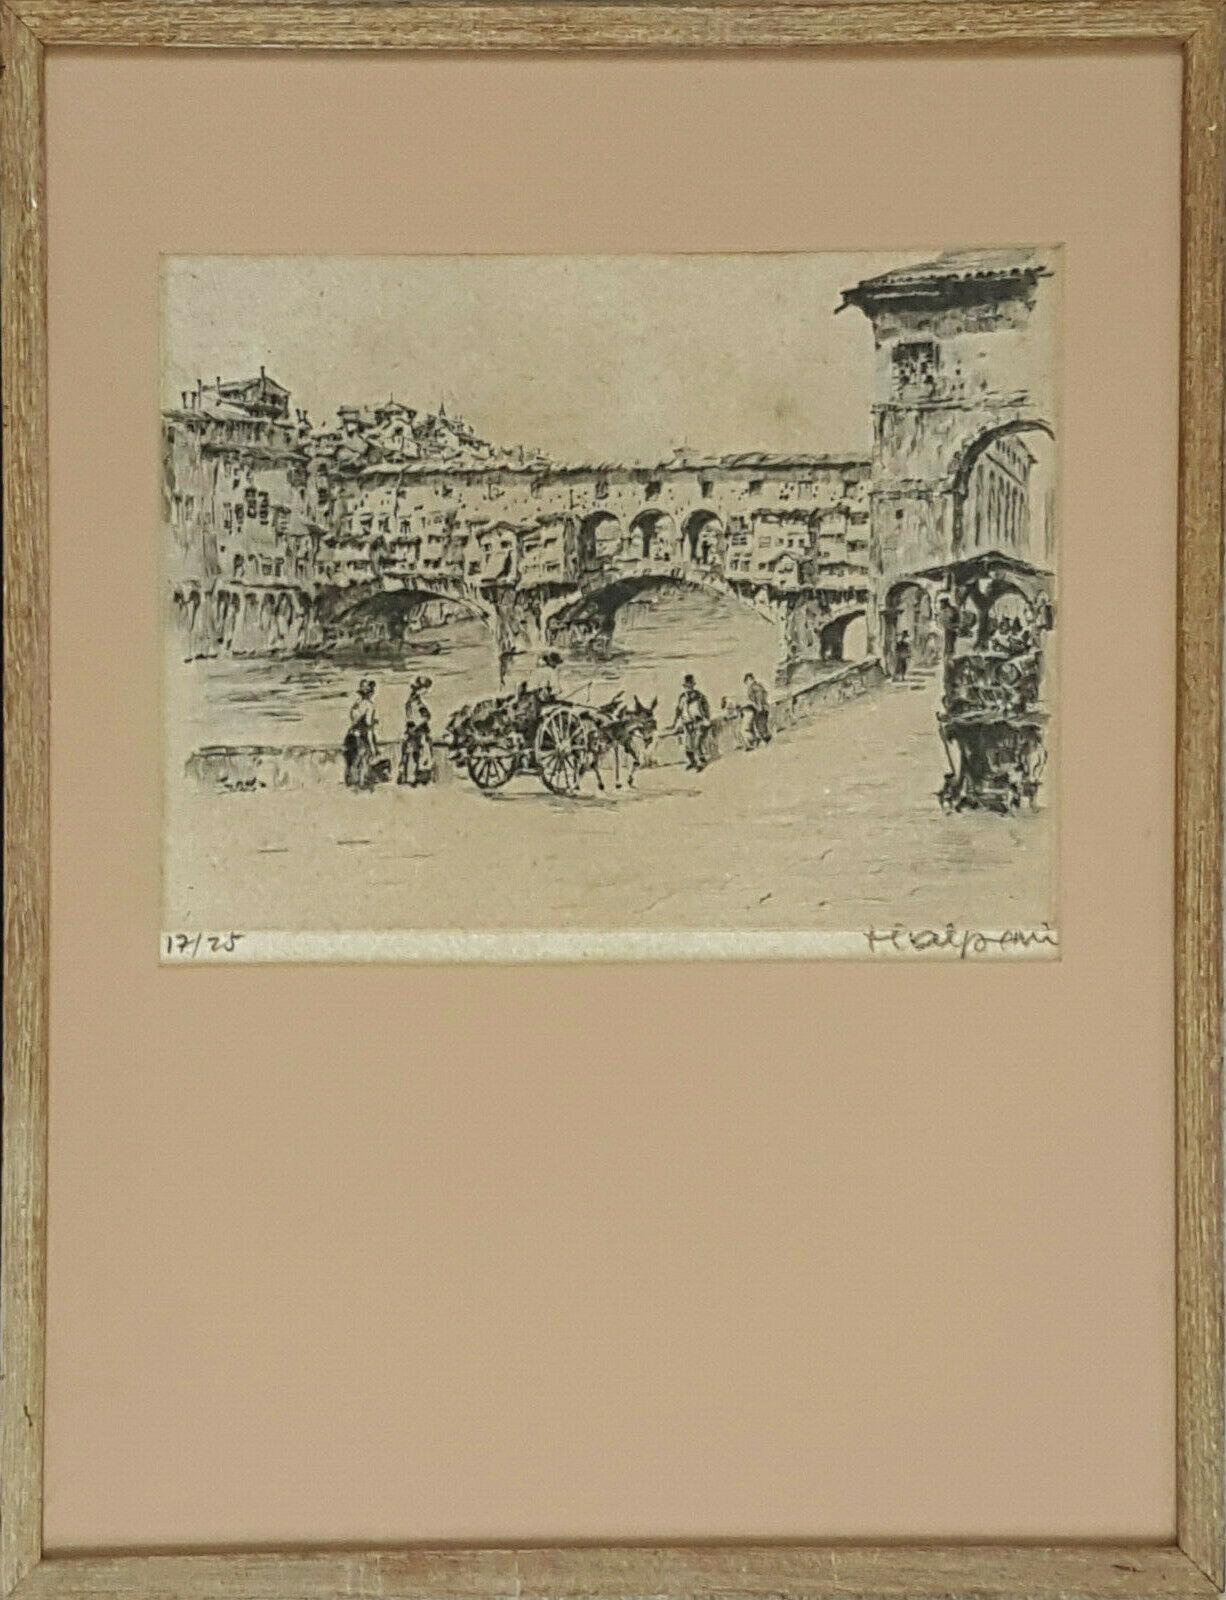 Etching by Frederick Halpern